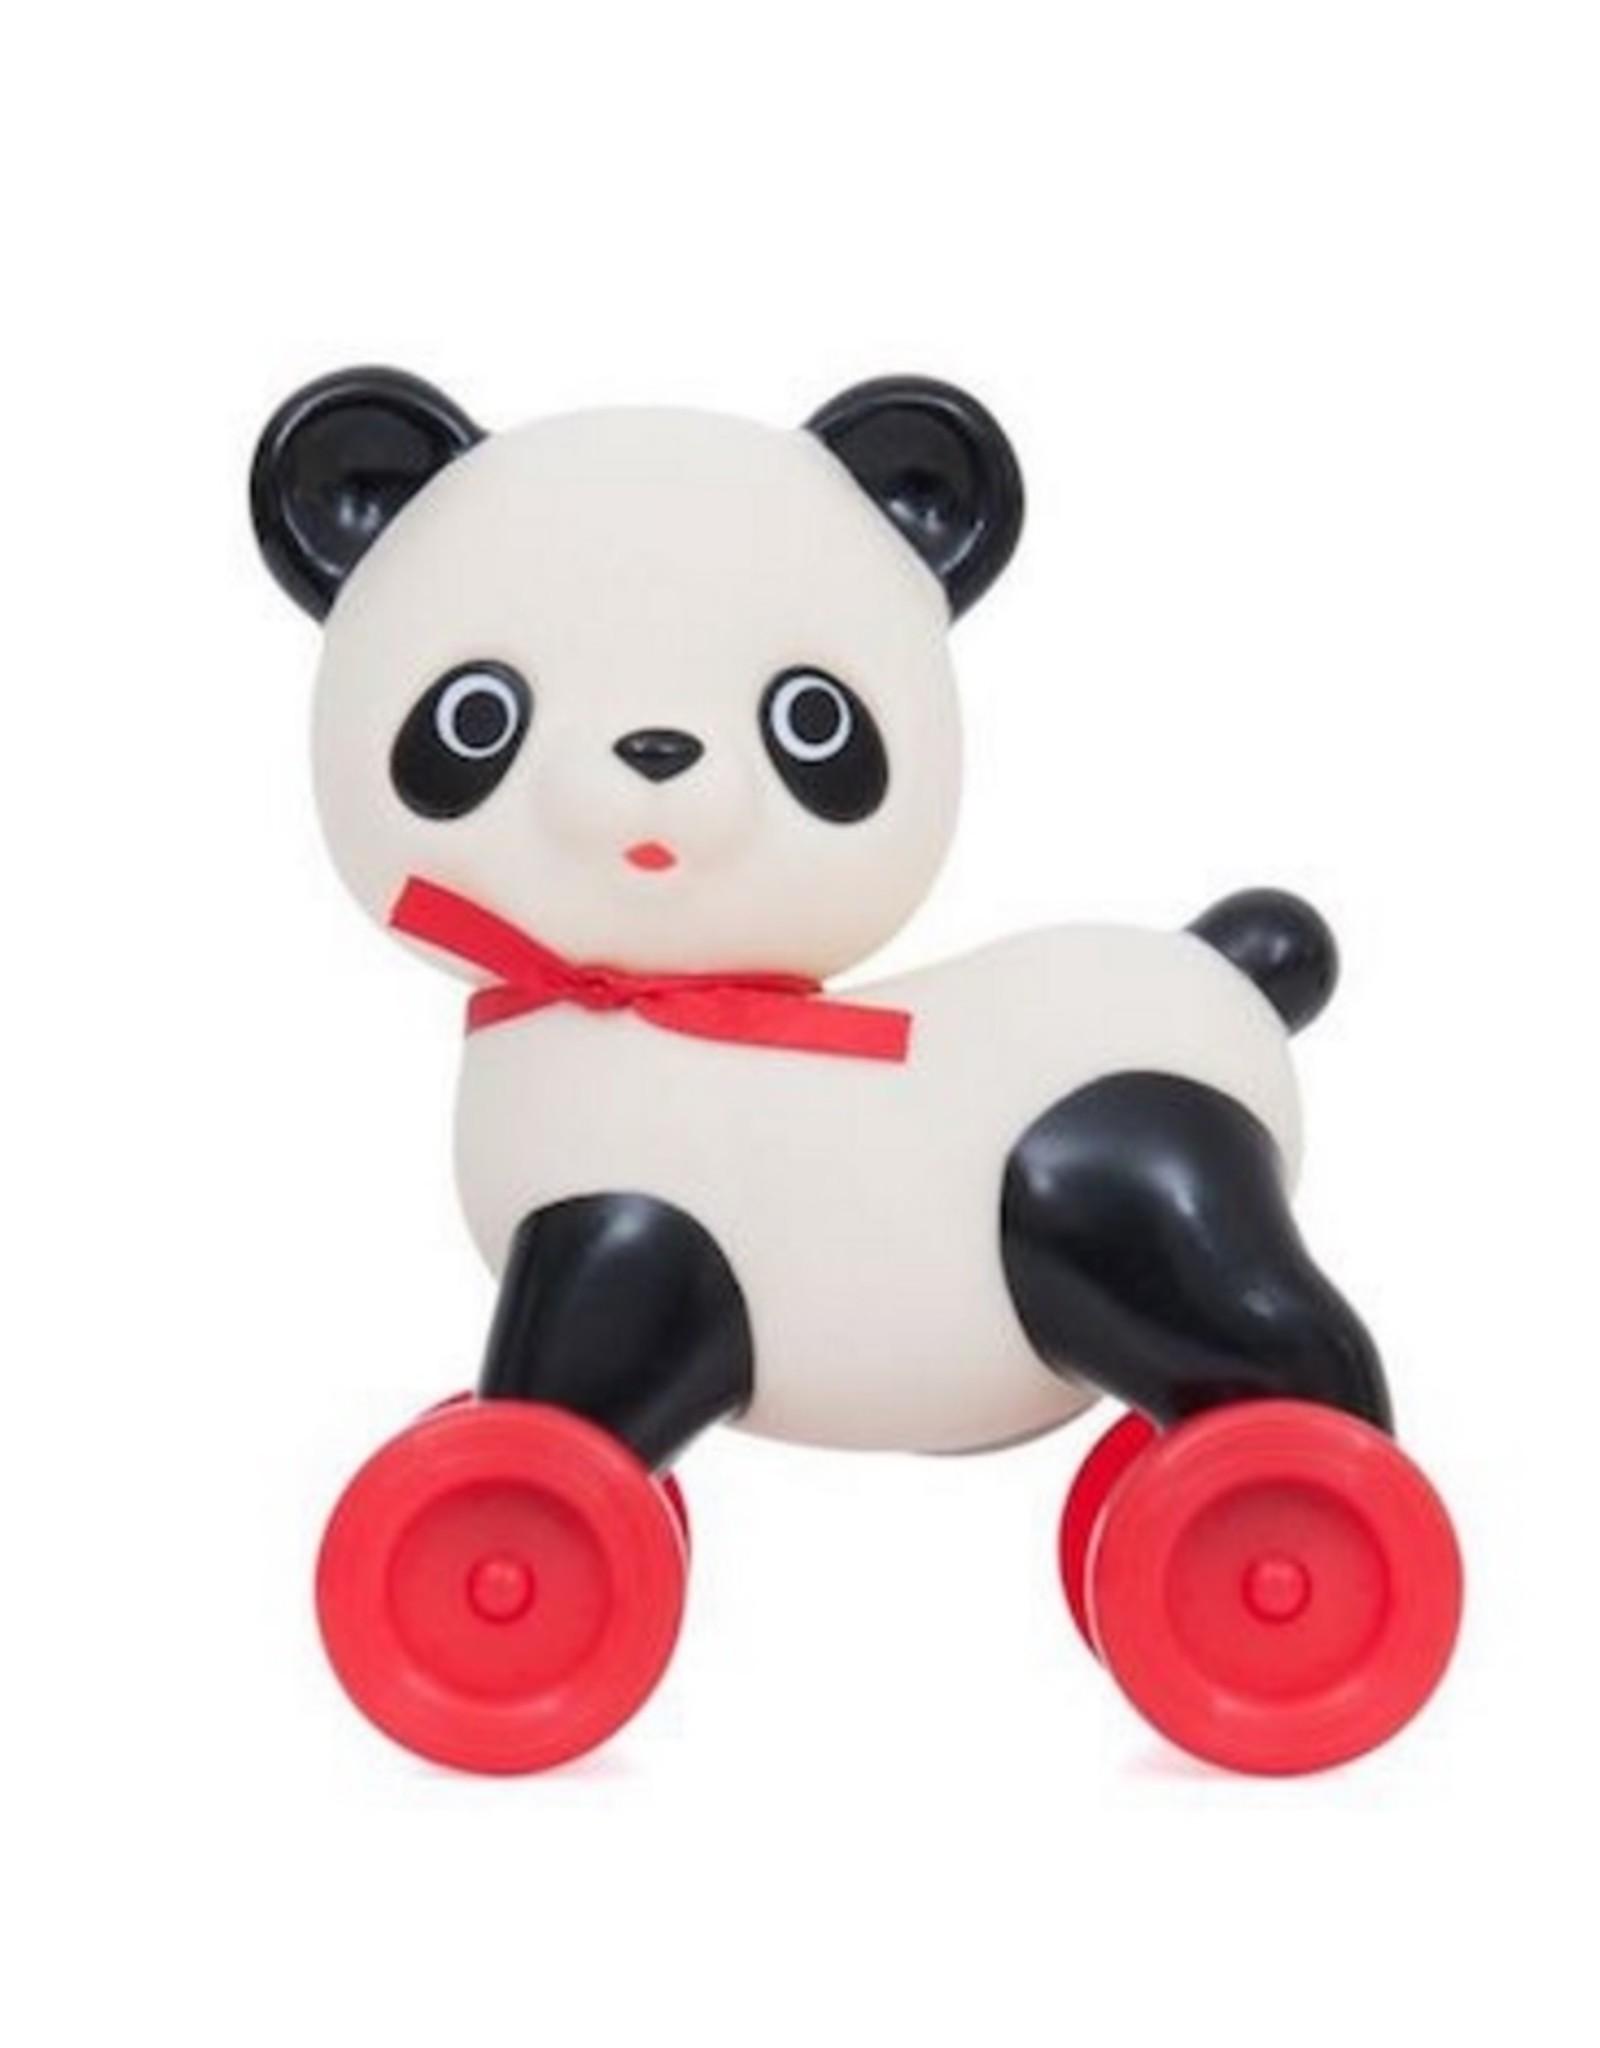 Lapin and Me - Setsu Chan Panda